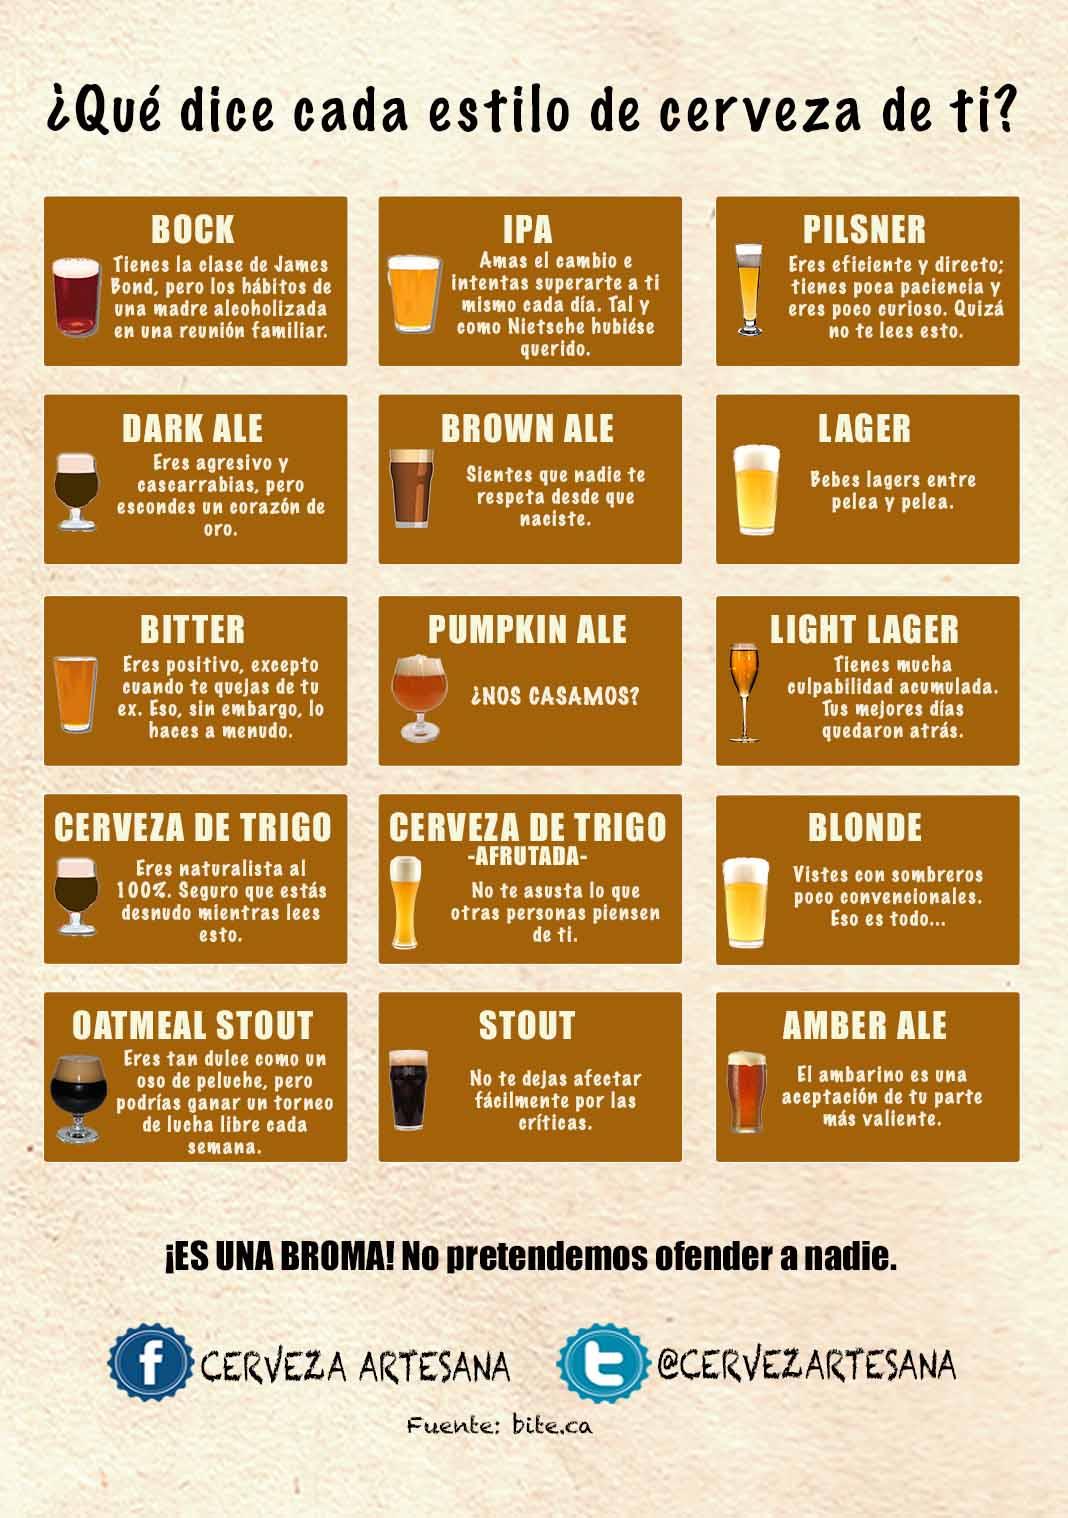 ¿Qué dice cada estilo de cerveza de ti?